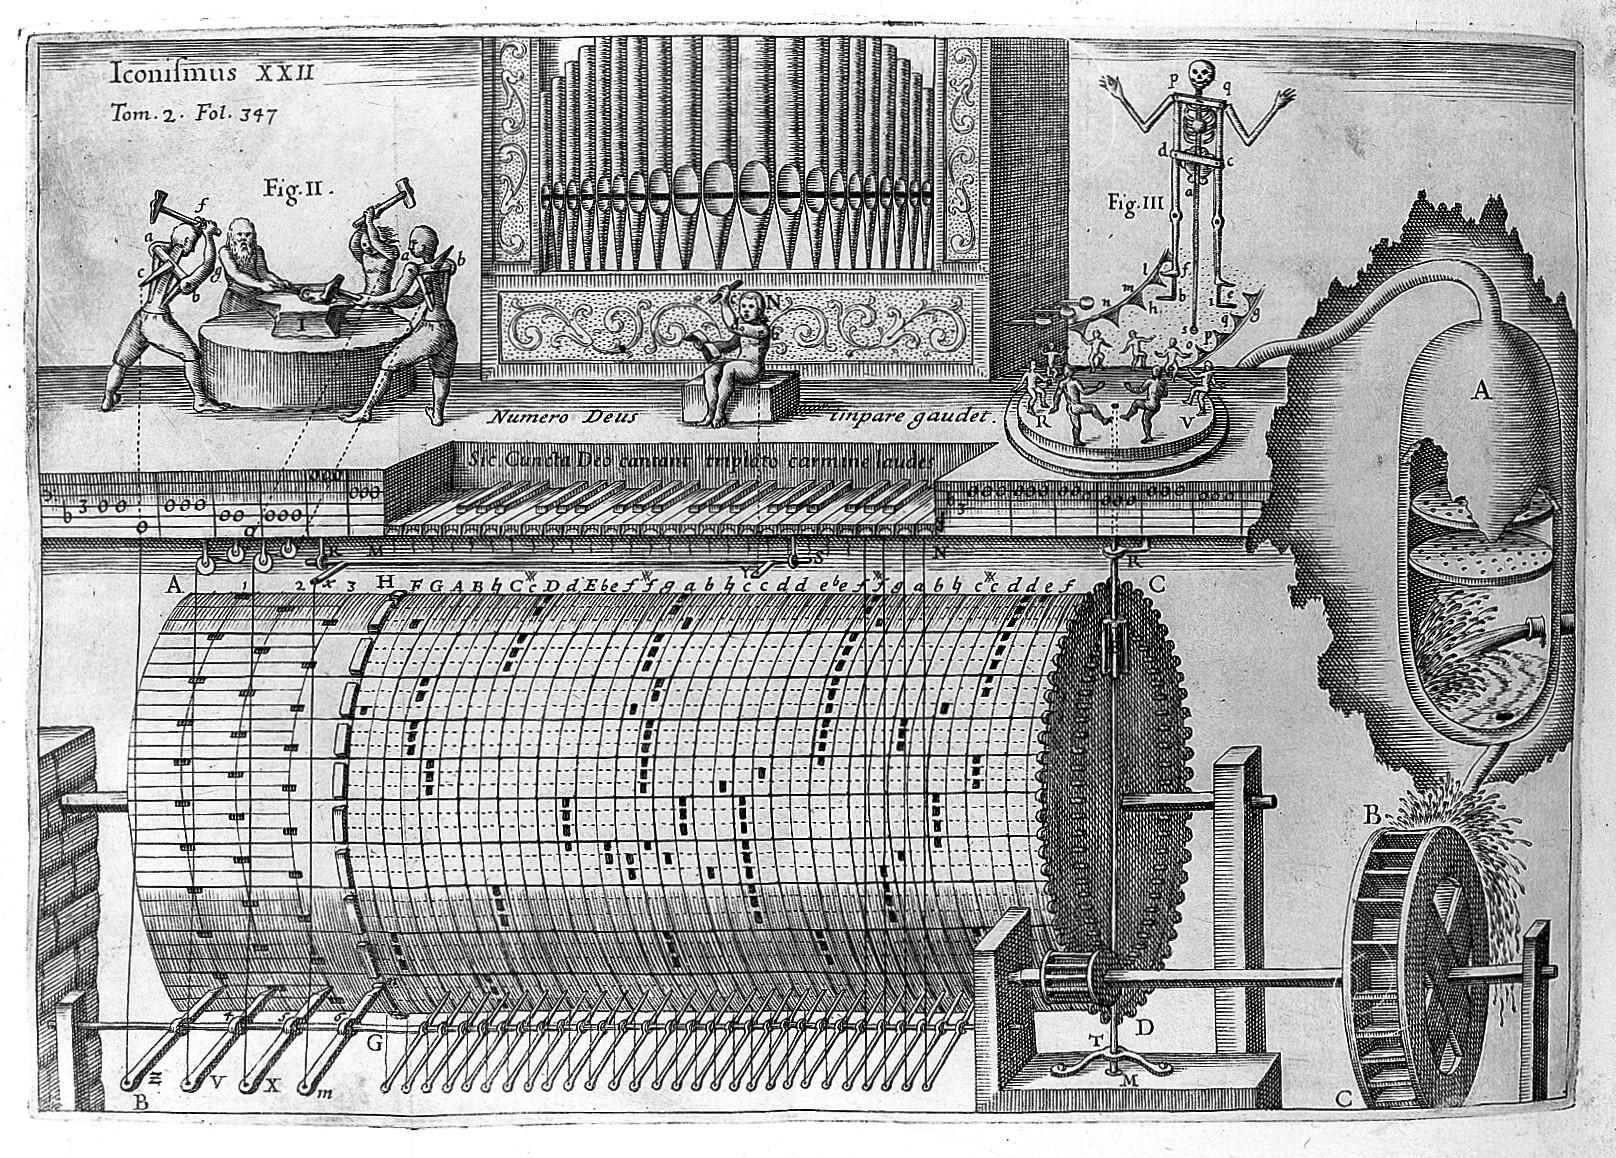 Kircher,_A.,__Musurgia_universalis_,_hydraulic_organ_public domain.jpg